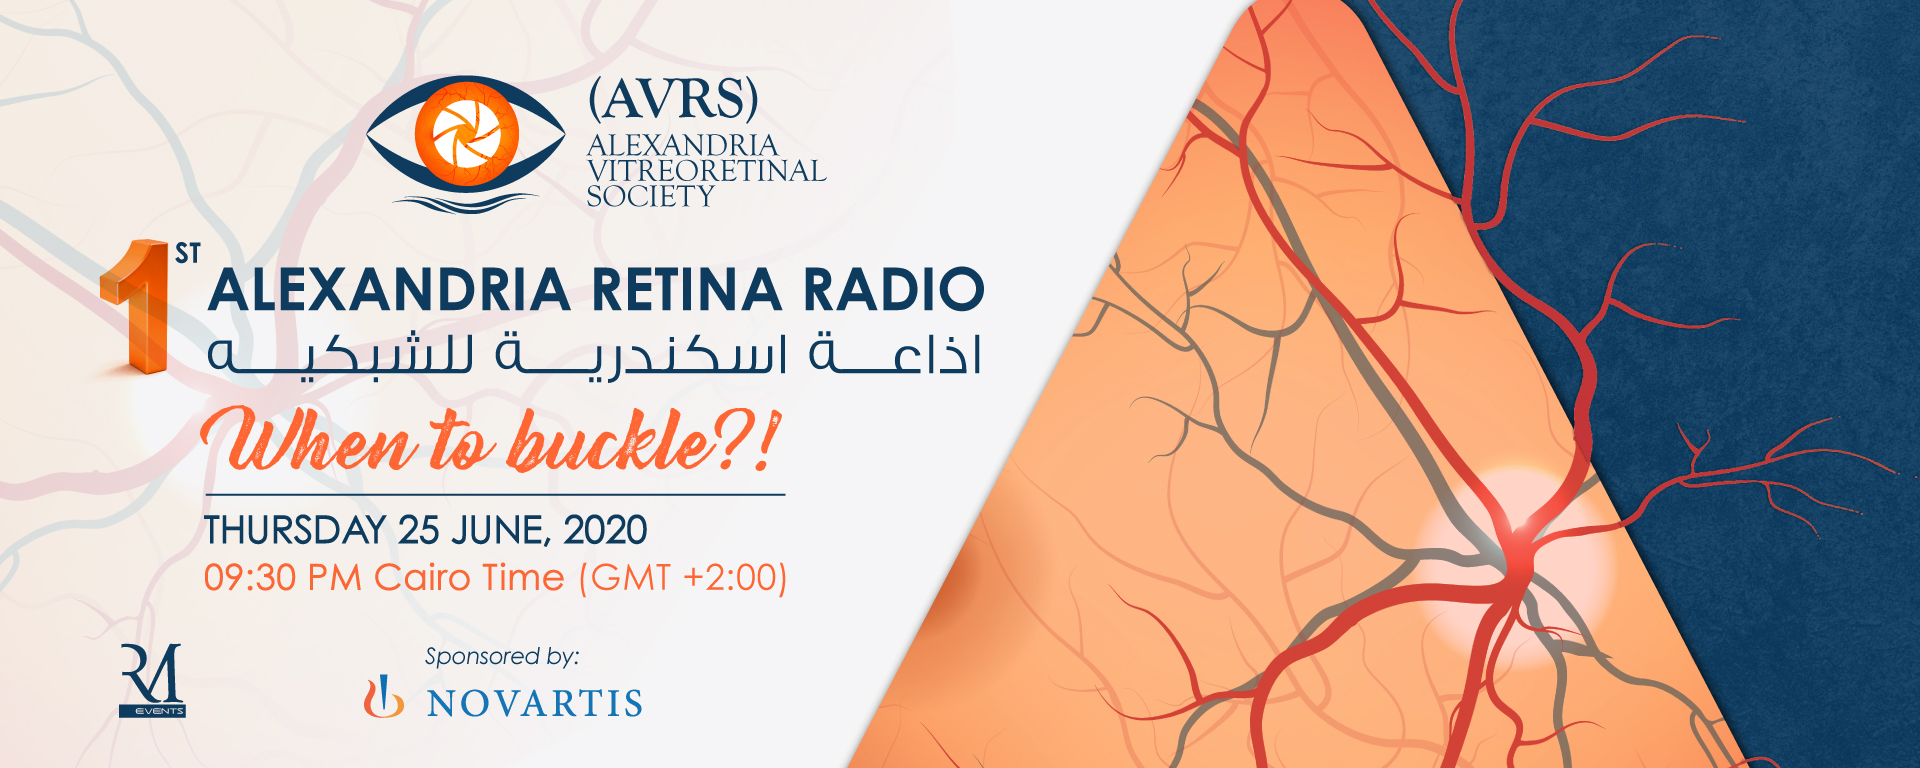 1st Alexandria Retina Radio